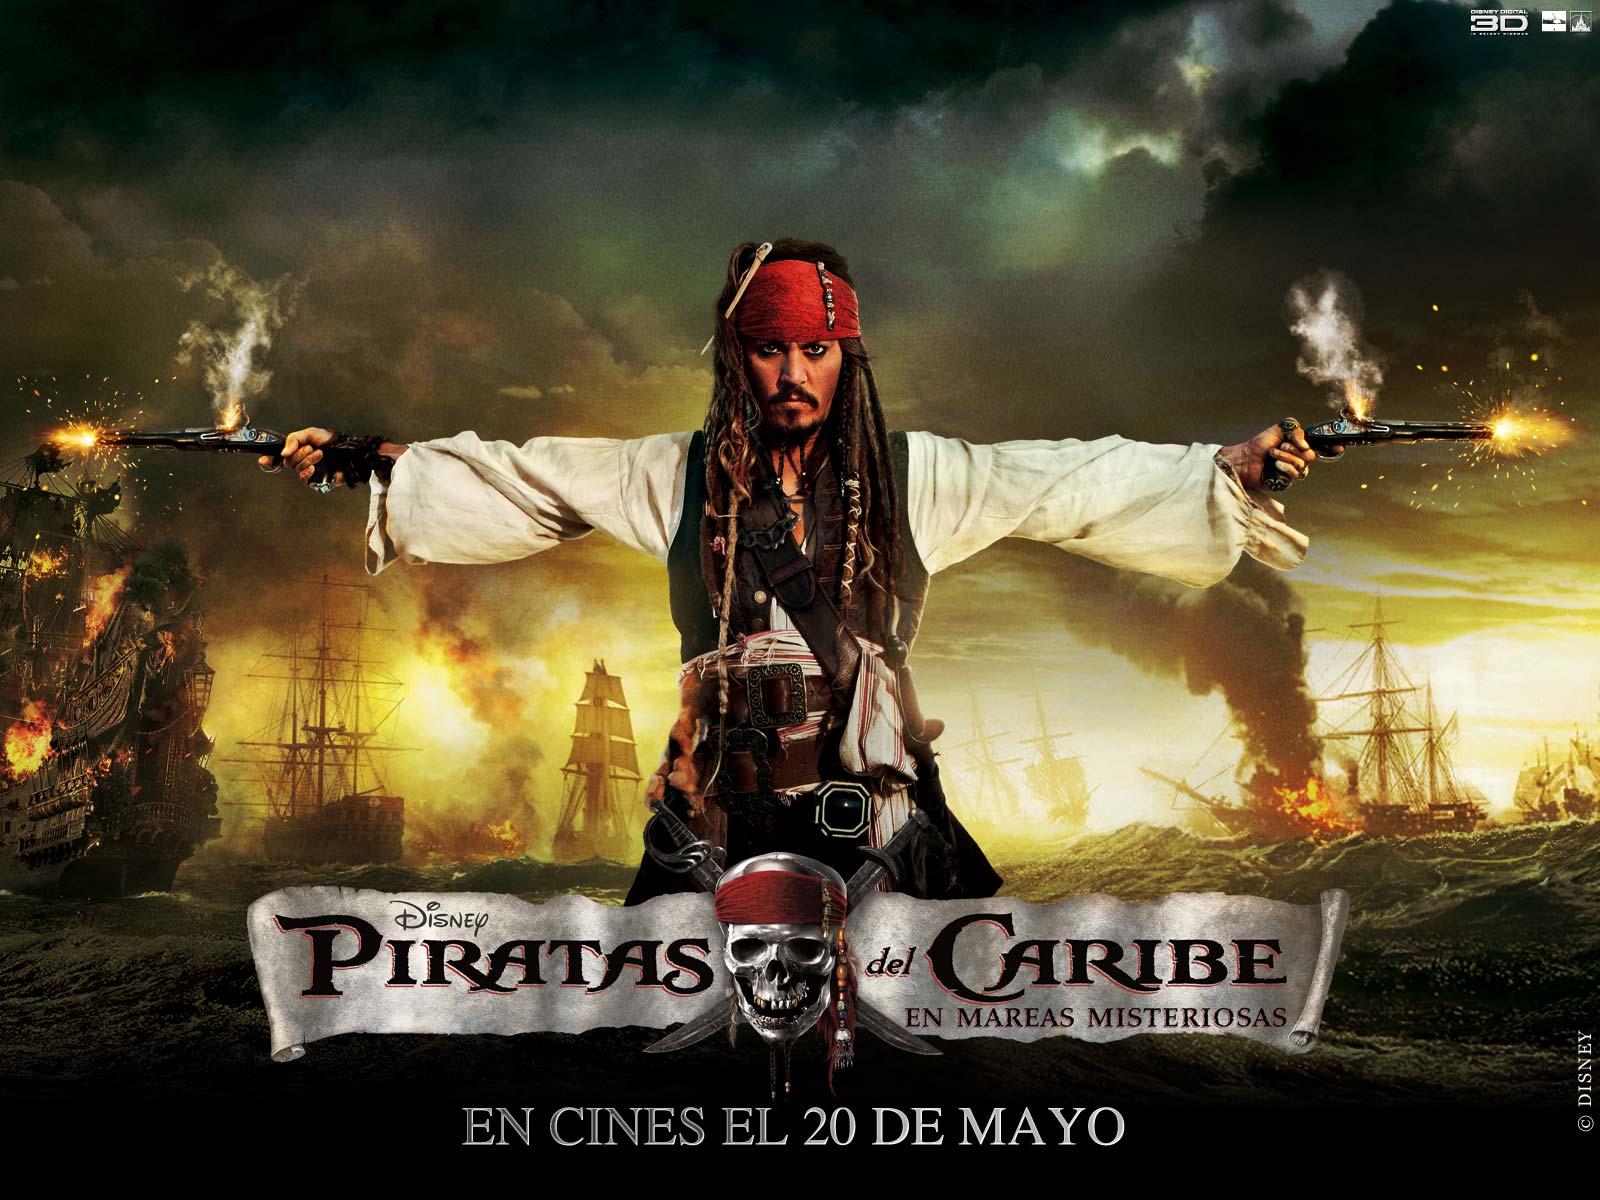 http://1.bp.blogspot.com/-MUwTBDJqgrc/TfKgYqWs0DI/AAAAAAAAARY/Y8hWhdy4RUI/s1600/wallpaper_jack_sparrow_piratas_del_caribe_4.jpg